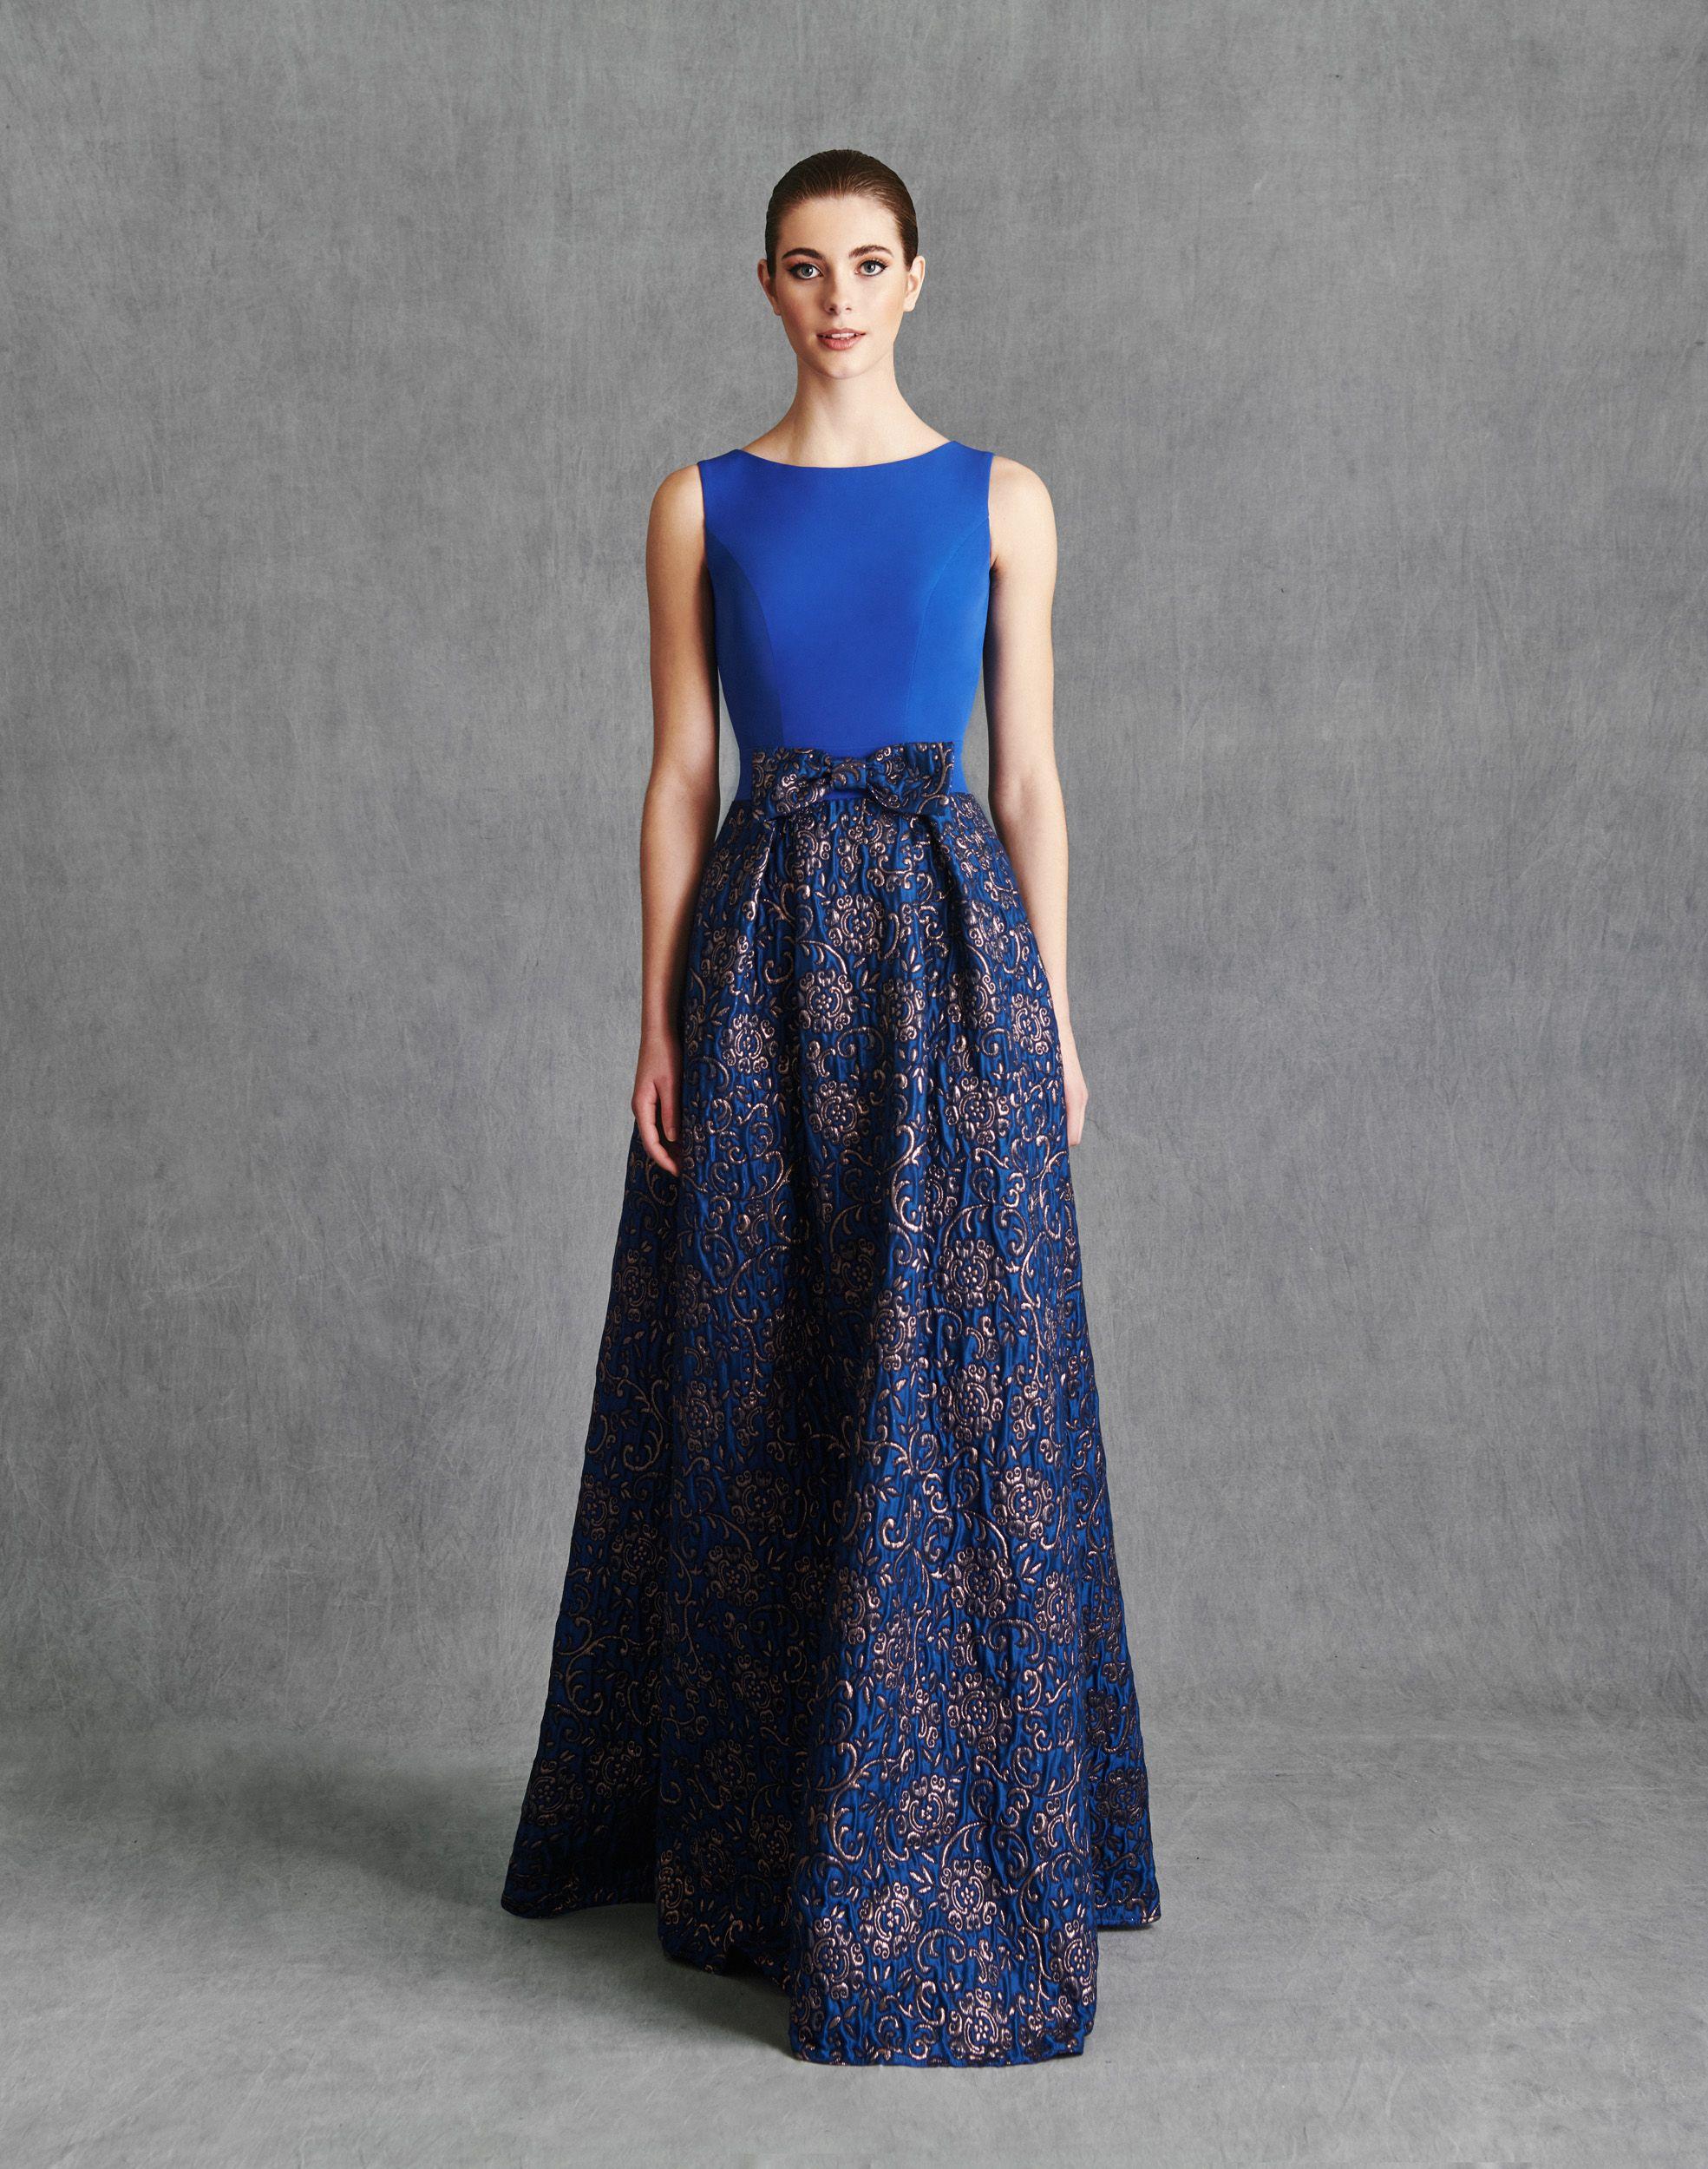 Vestidos de Fiesta 2020 - Silvia Fernandez Atelier - INDONESIA